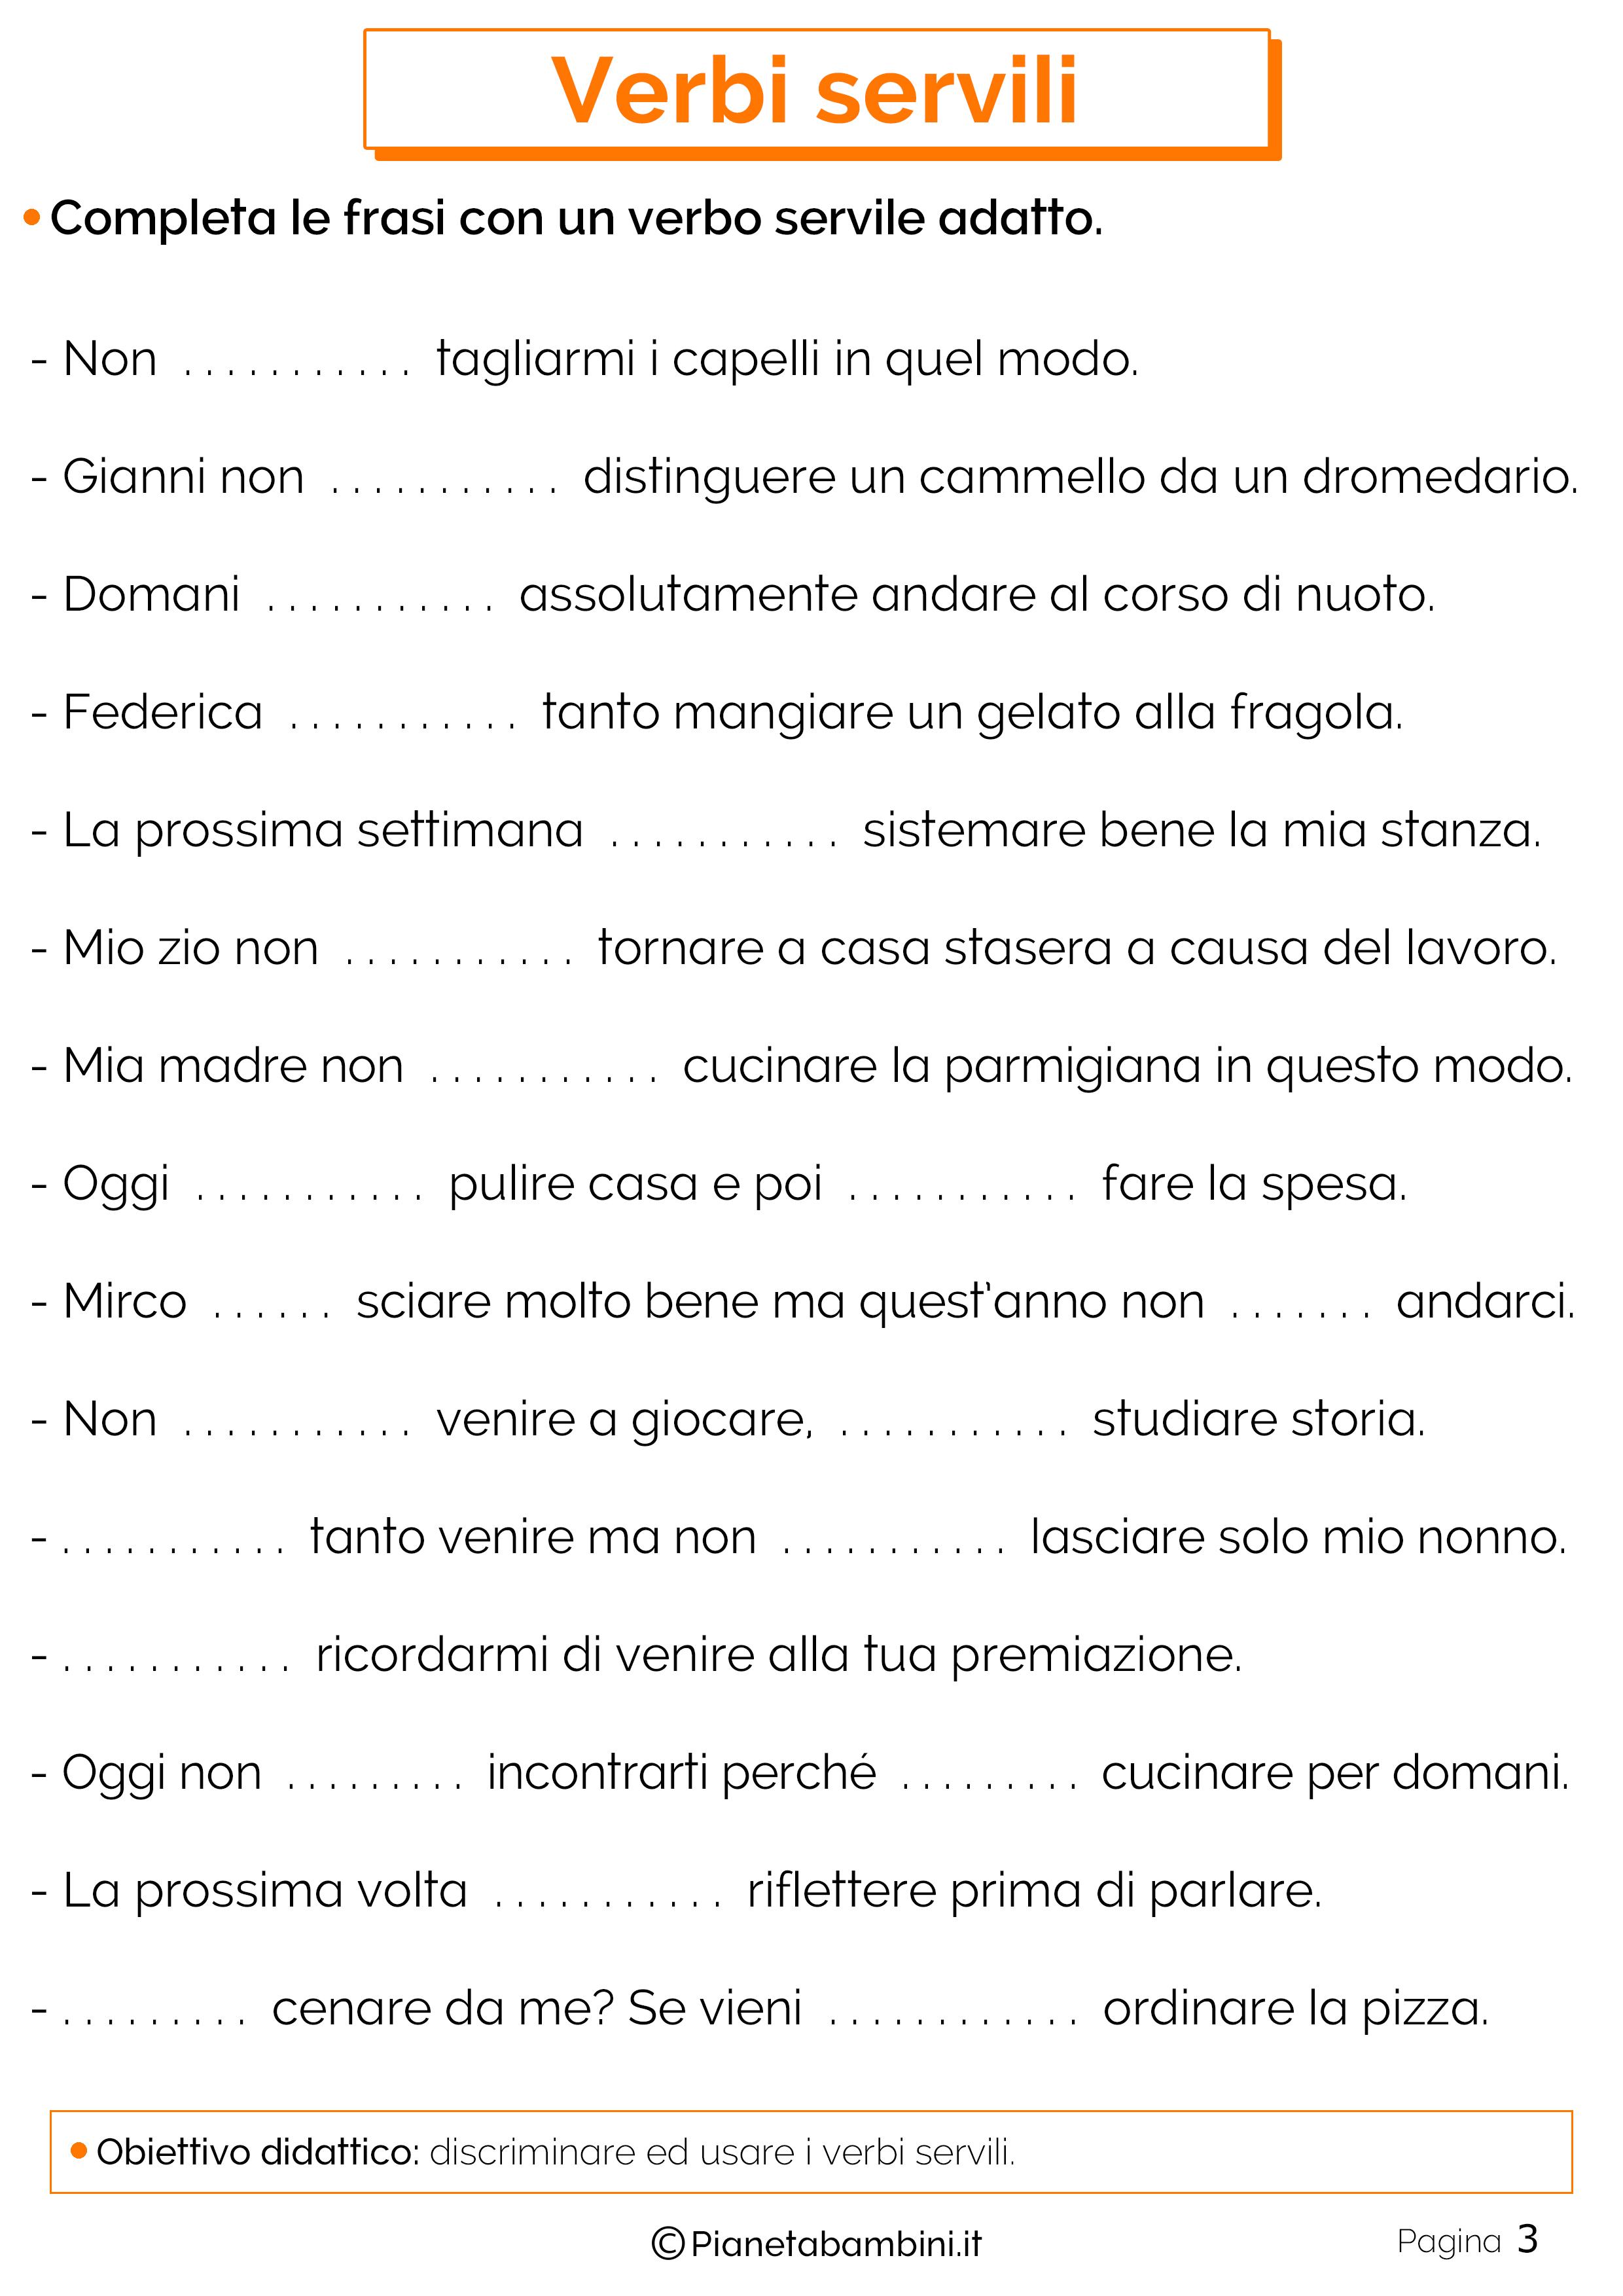 Schede didattiche sui verbi servili 3